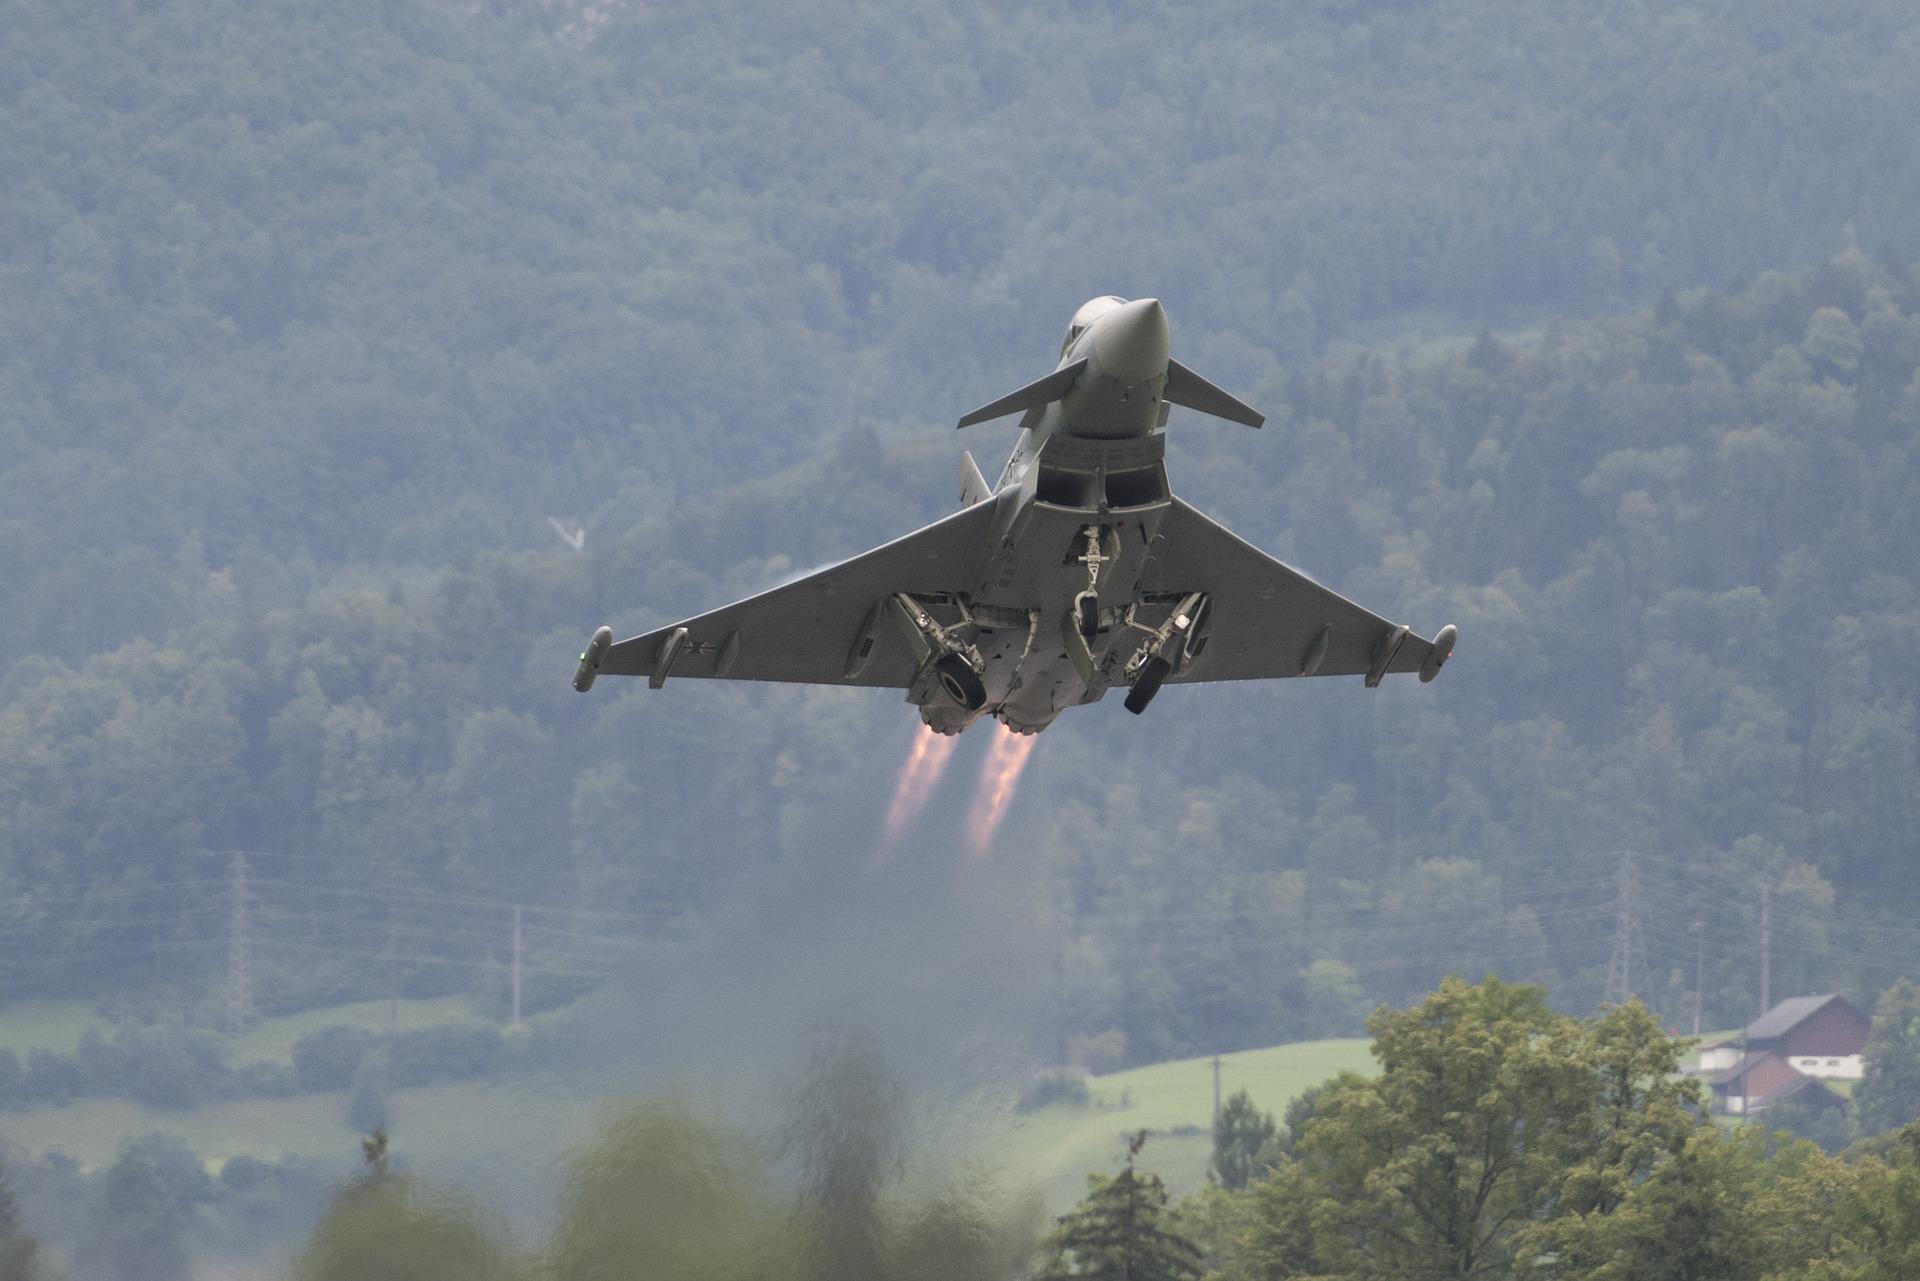 eurofighter-1579394_1920